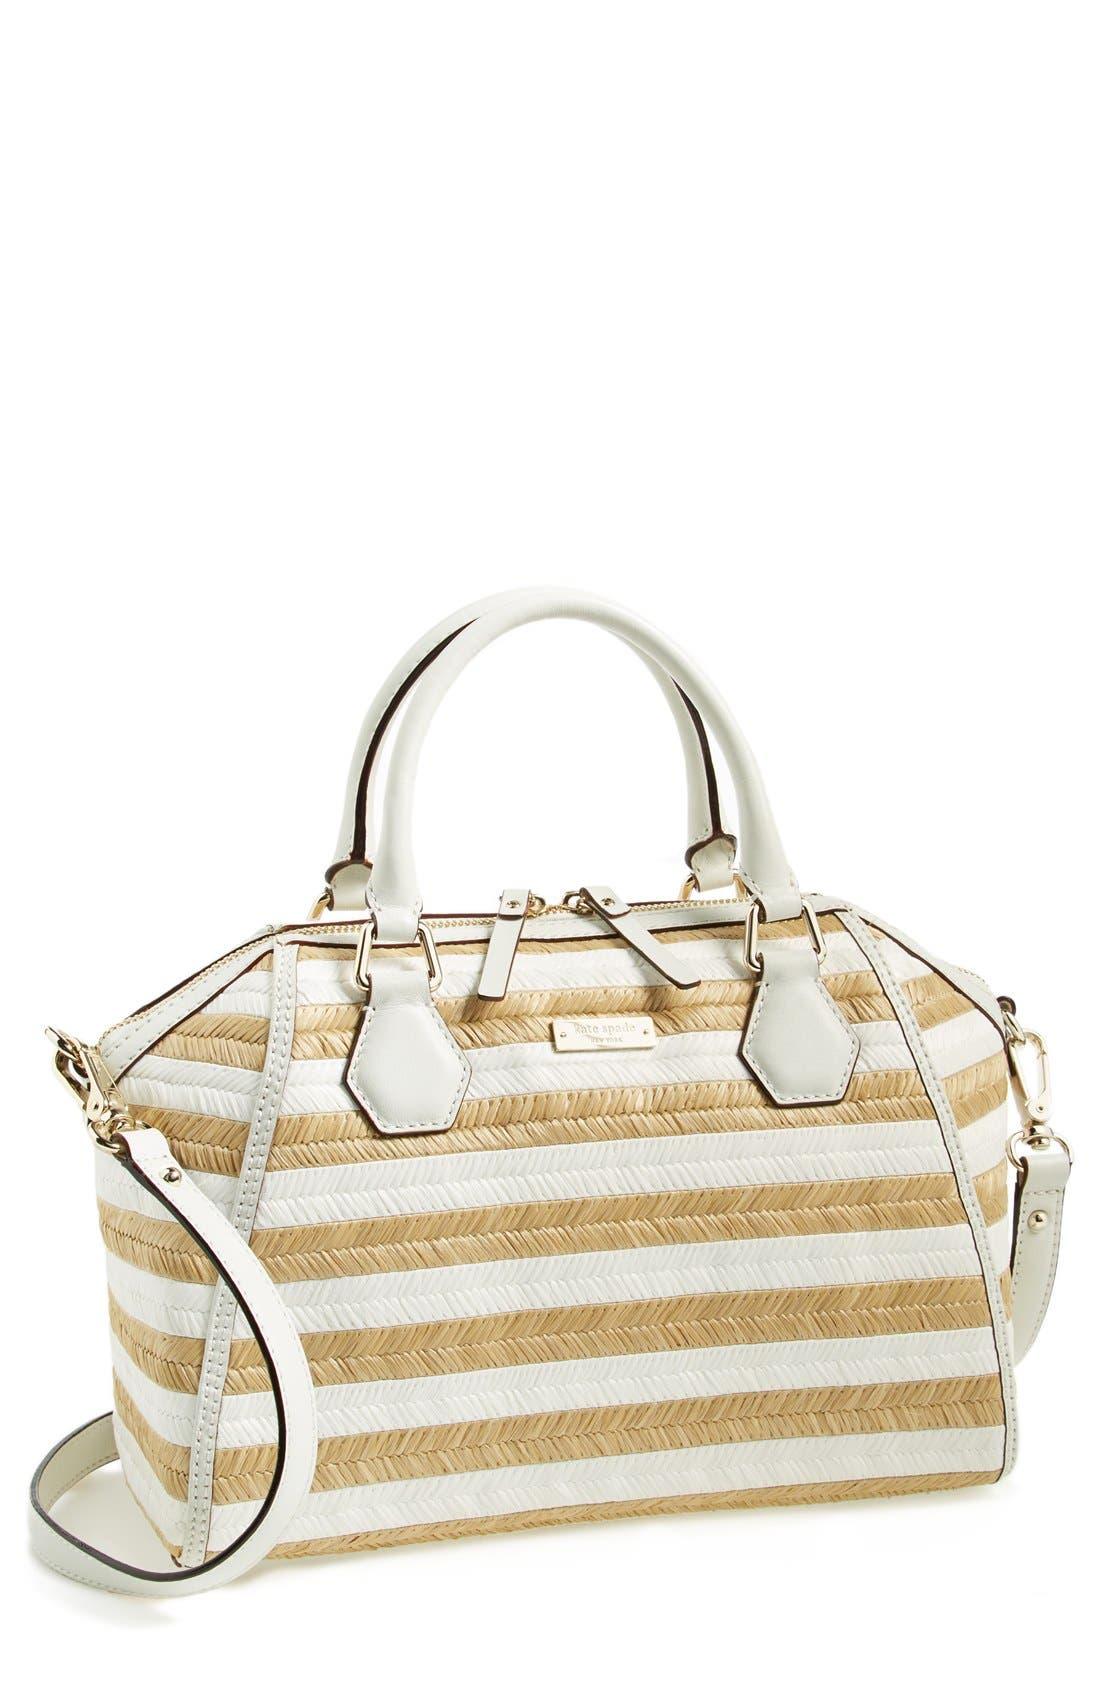 Main Image - kate spade new york 'pippa' straw satchel